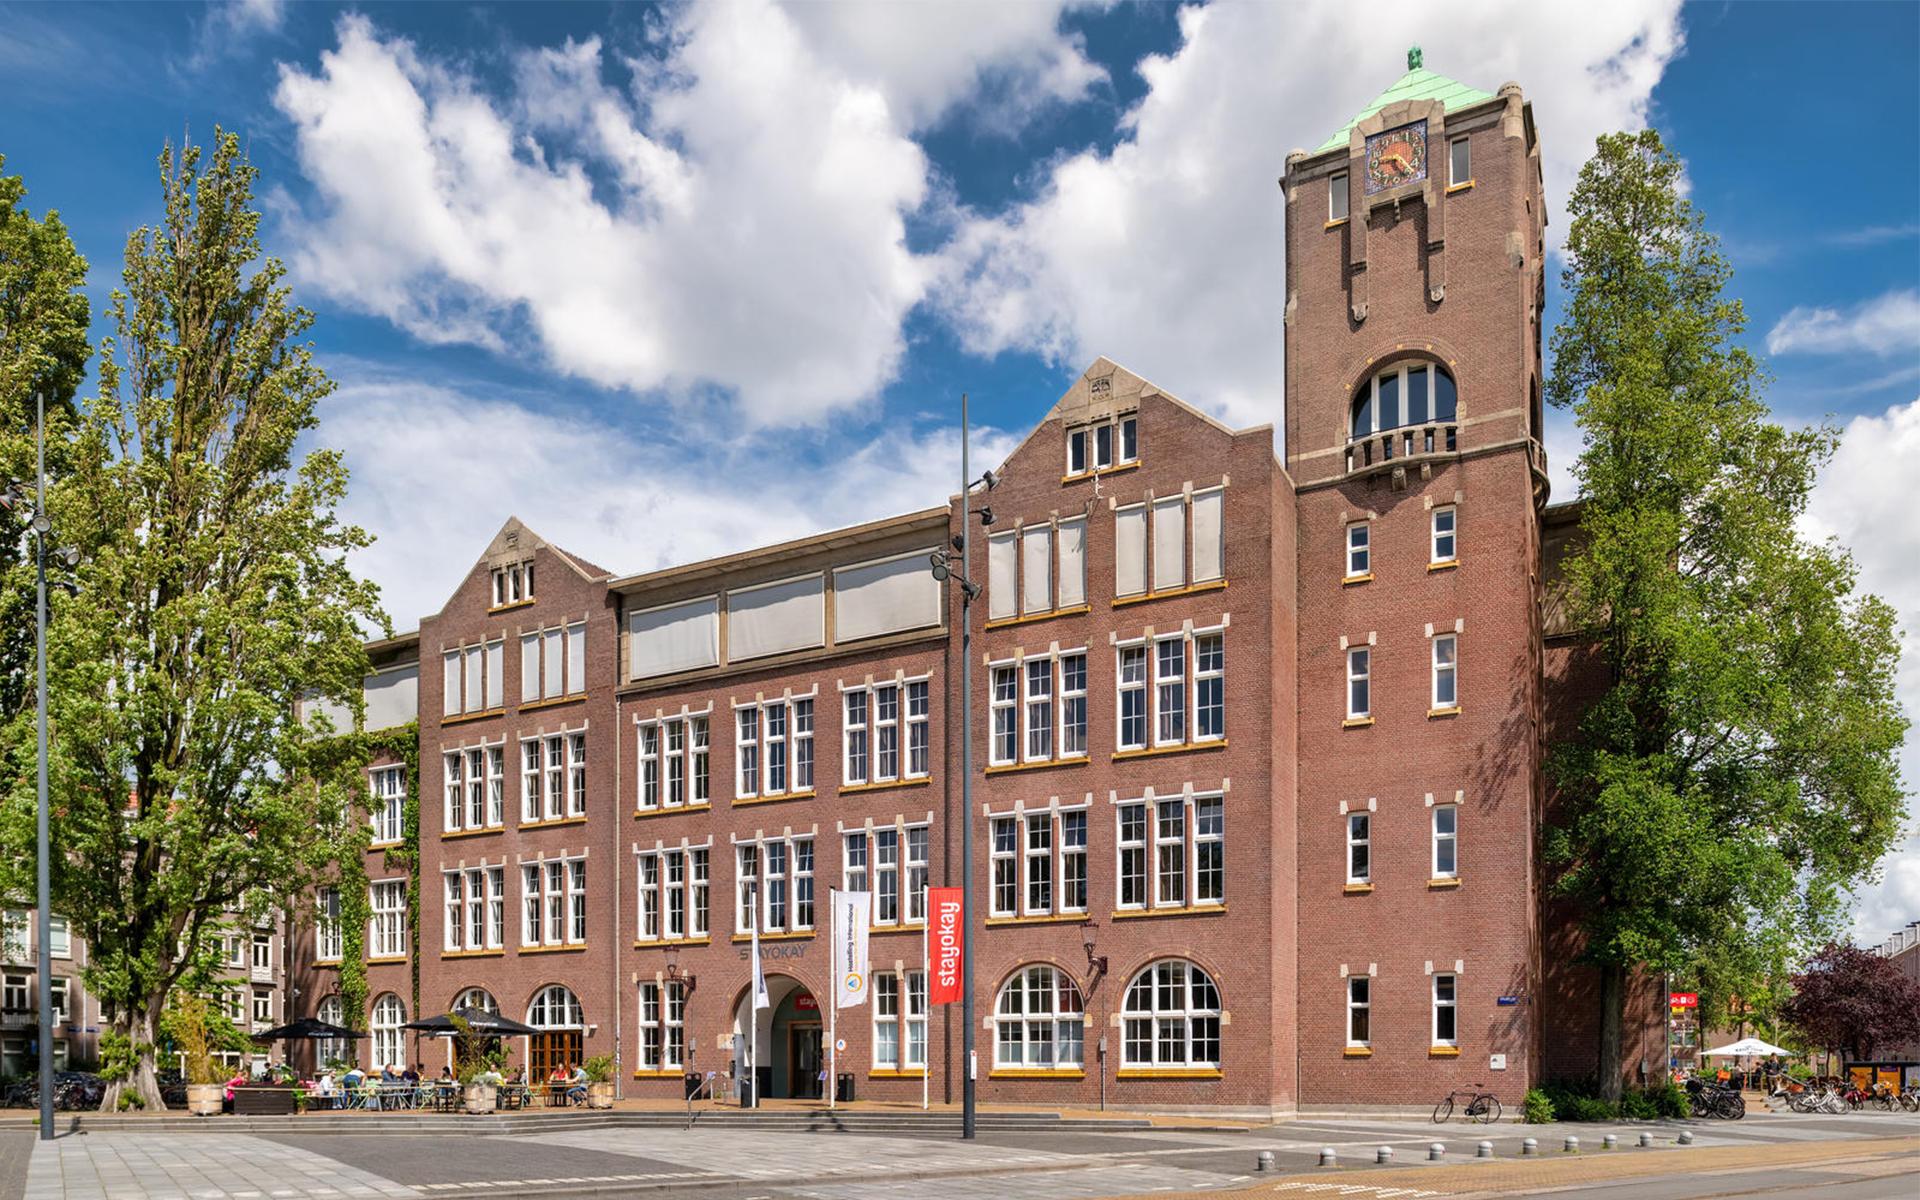 Stayokay Oost hostel Spatial & Interior Design building Amsterdam